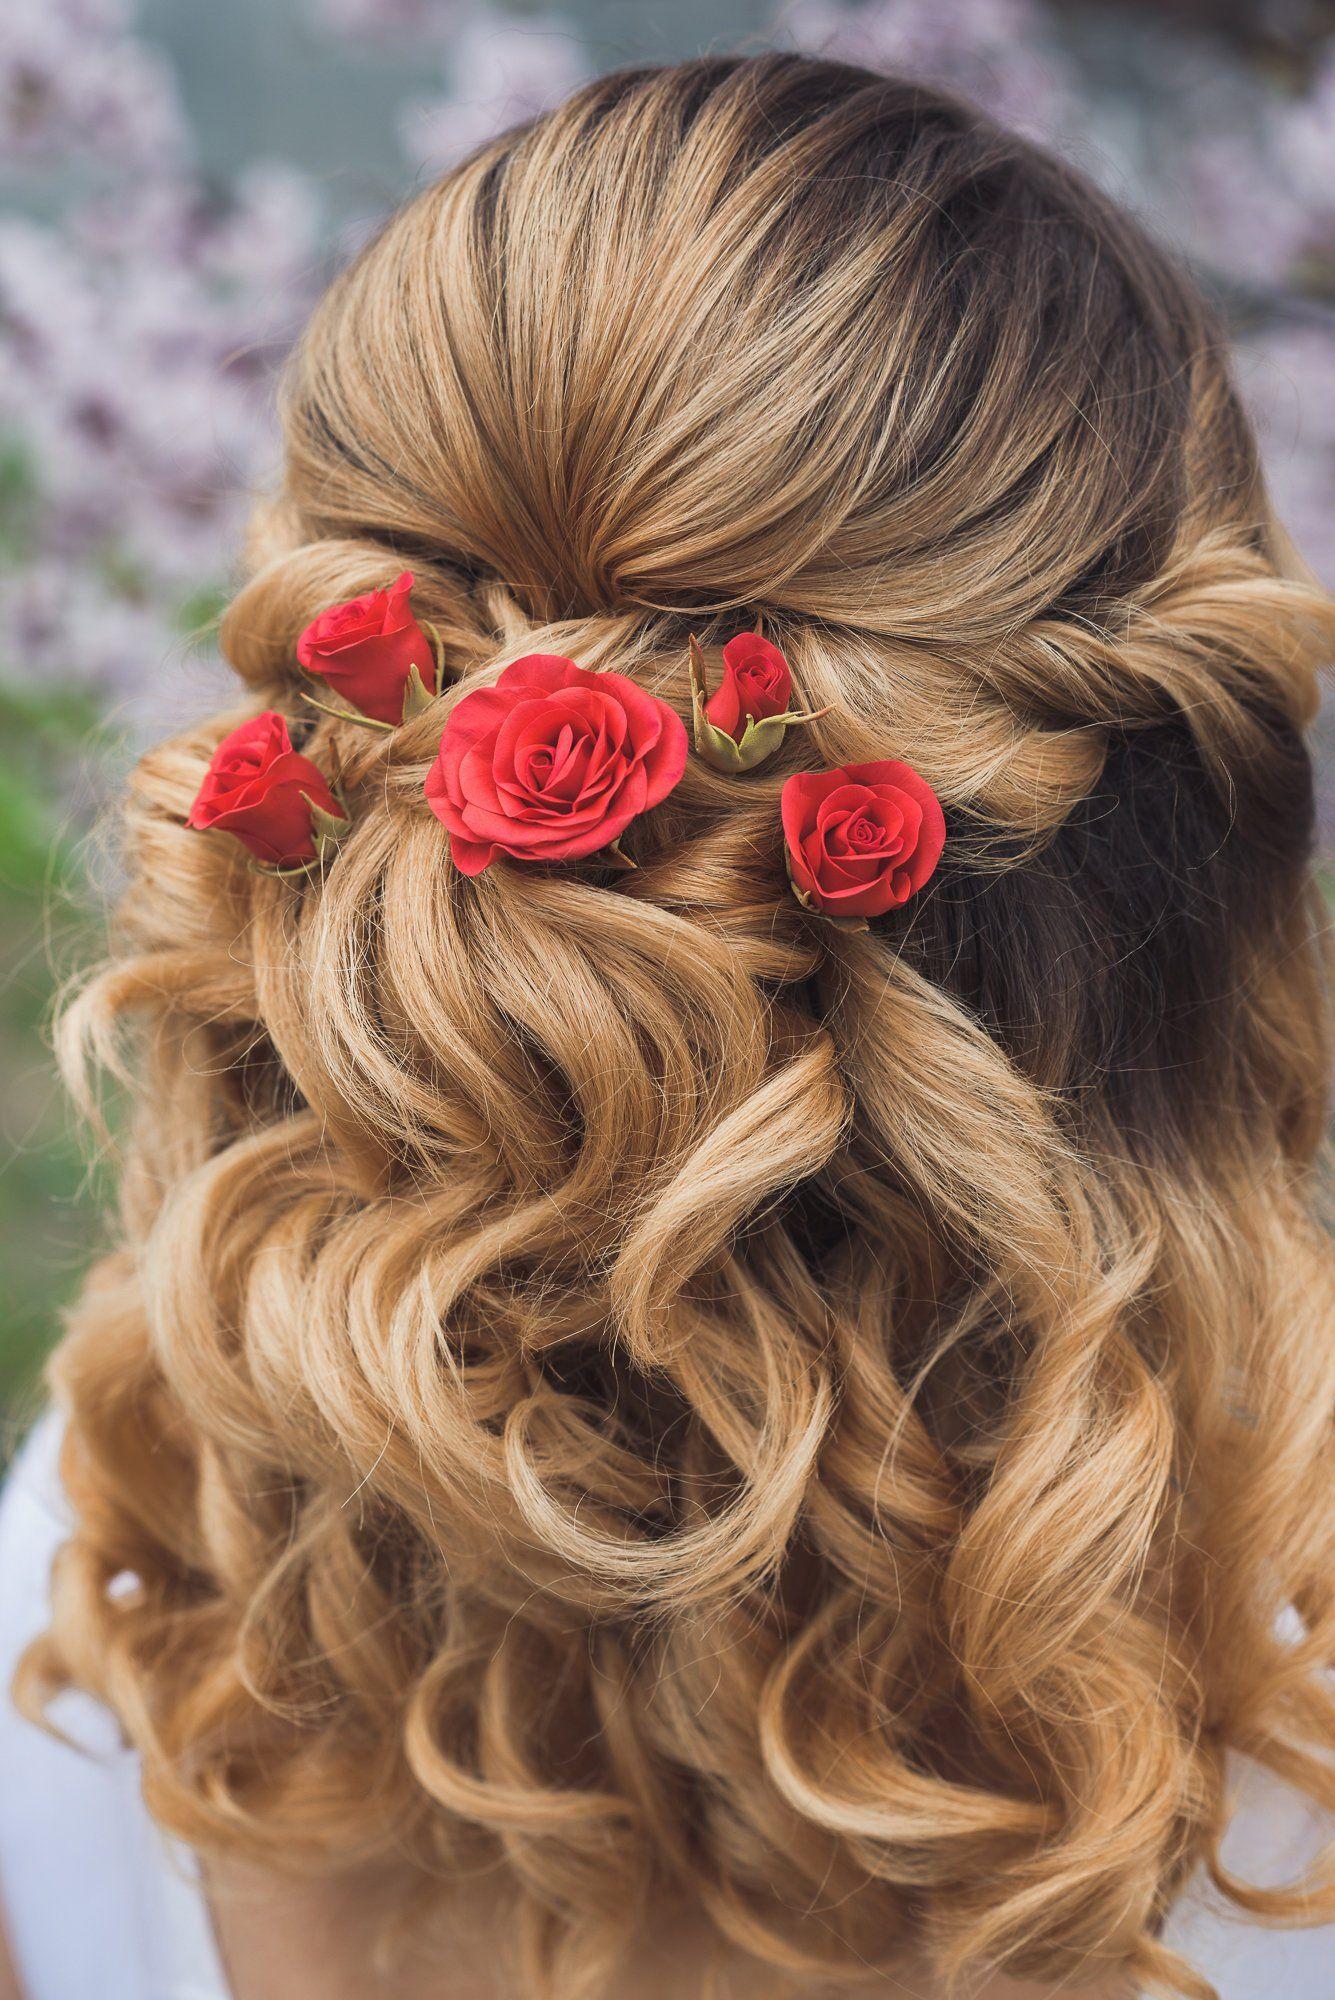 Red Roses Hair Pins Set Of 5 Rustic Wedding Hair Accessories Etsy Rustic Wedding Hair Accessories Rose Hair Rustic Wedding Hairstyles